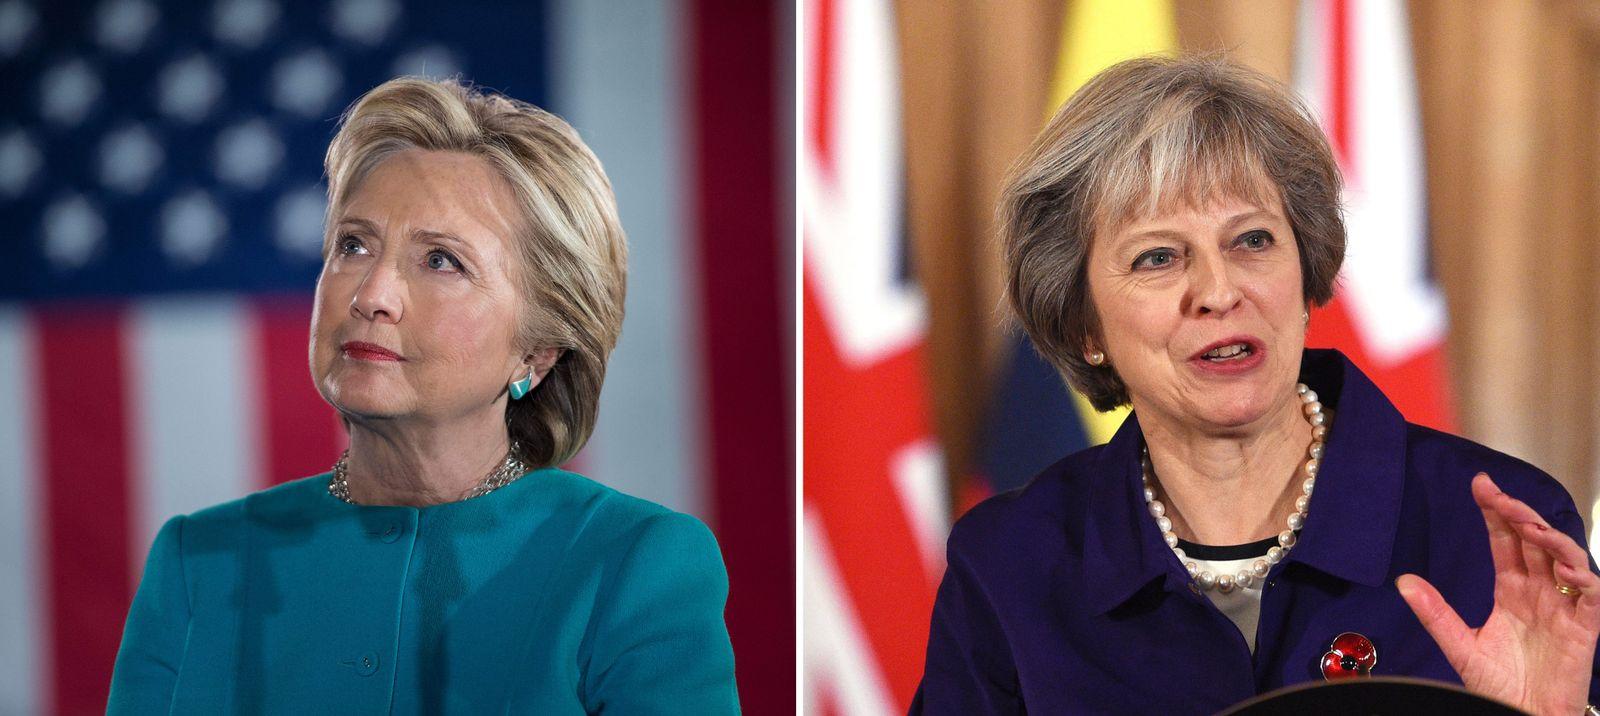 KOMBO Hillary Clinton / Theresa May